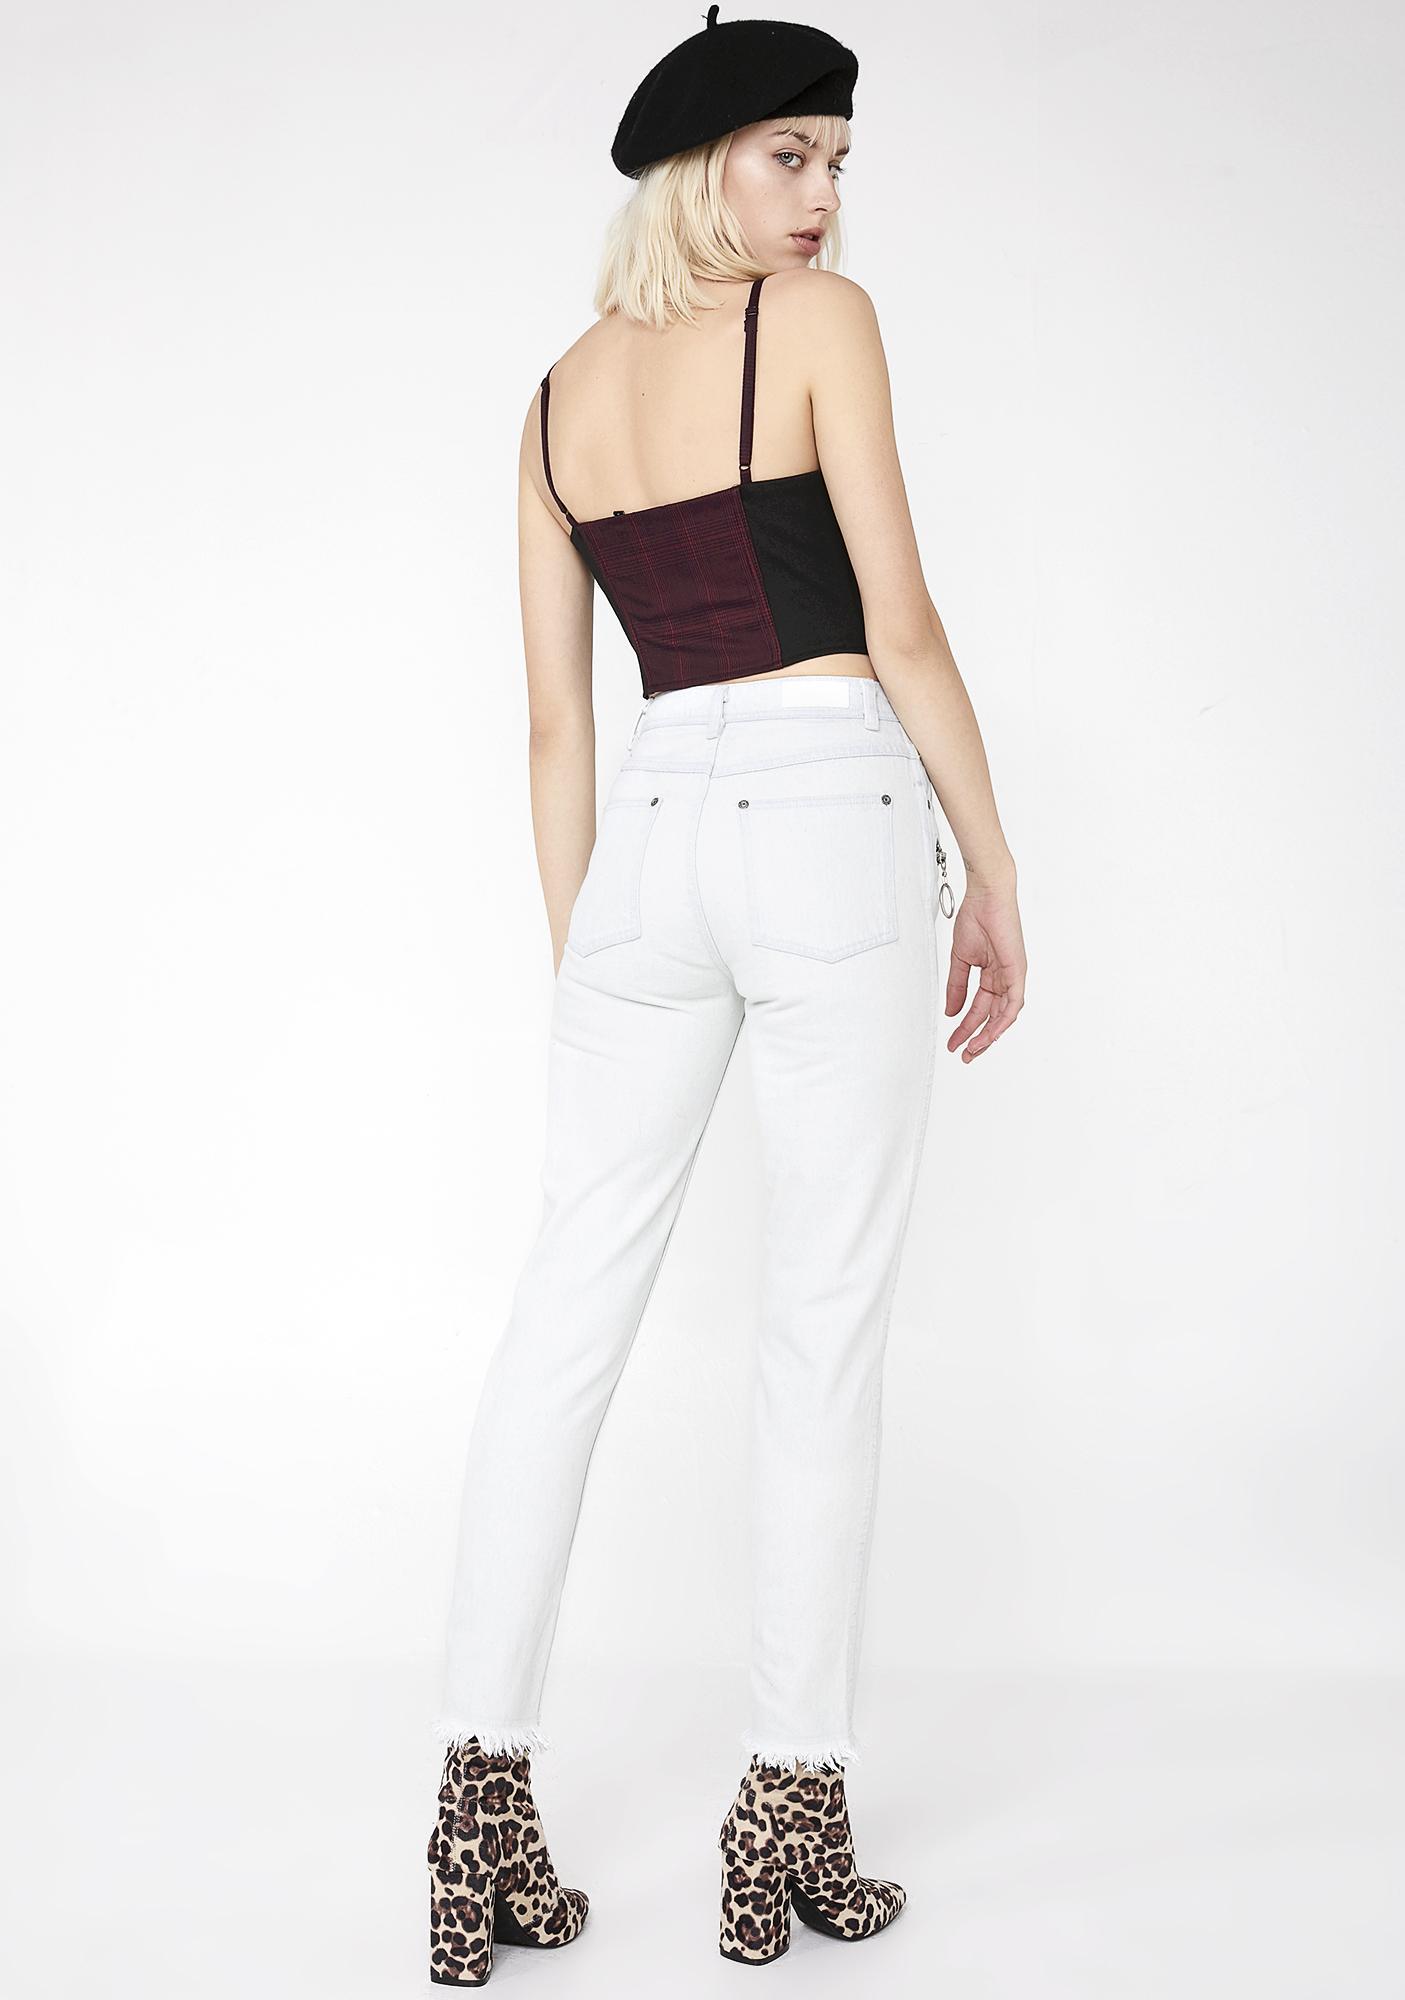 Nana Judy O-Ring Zipper Pants